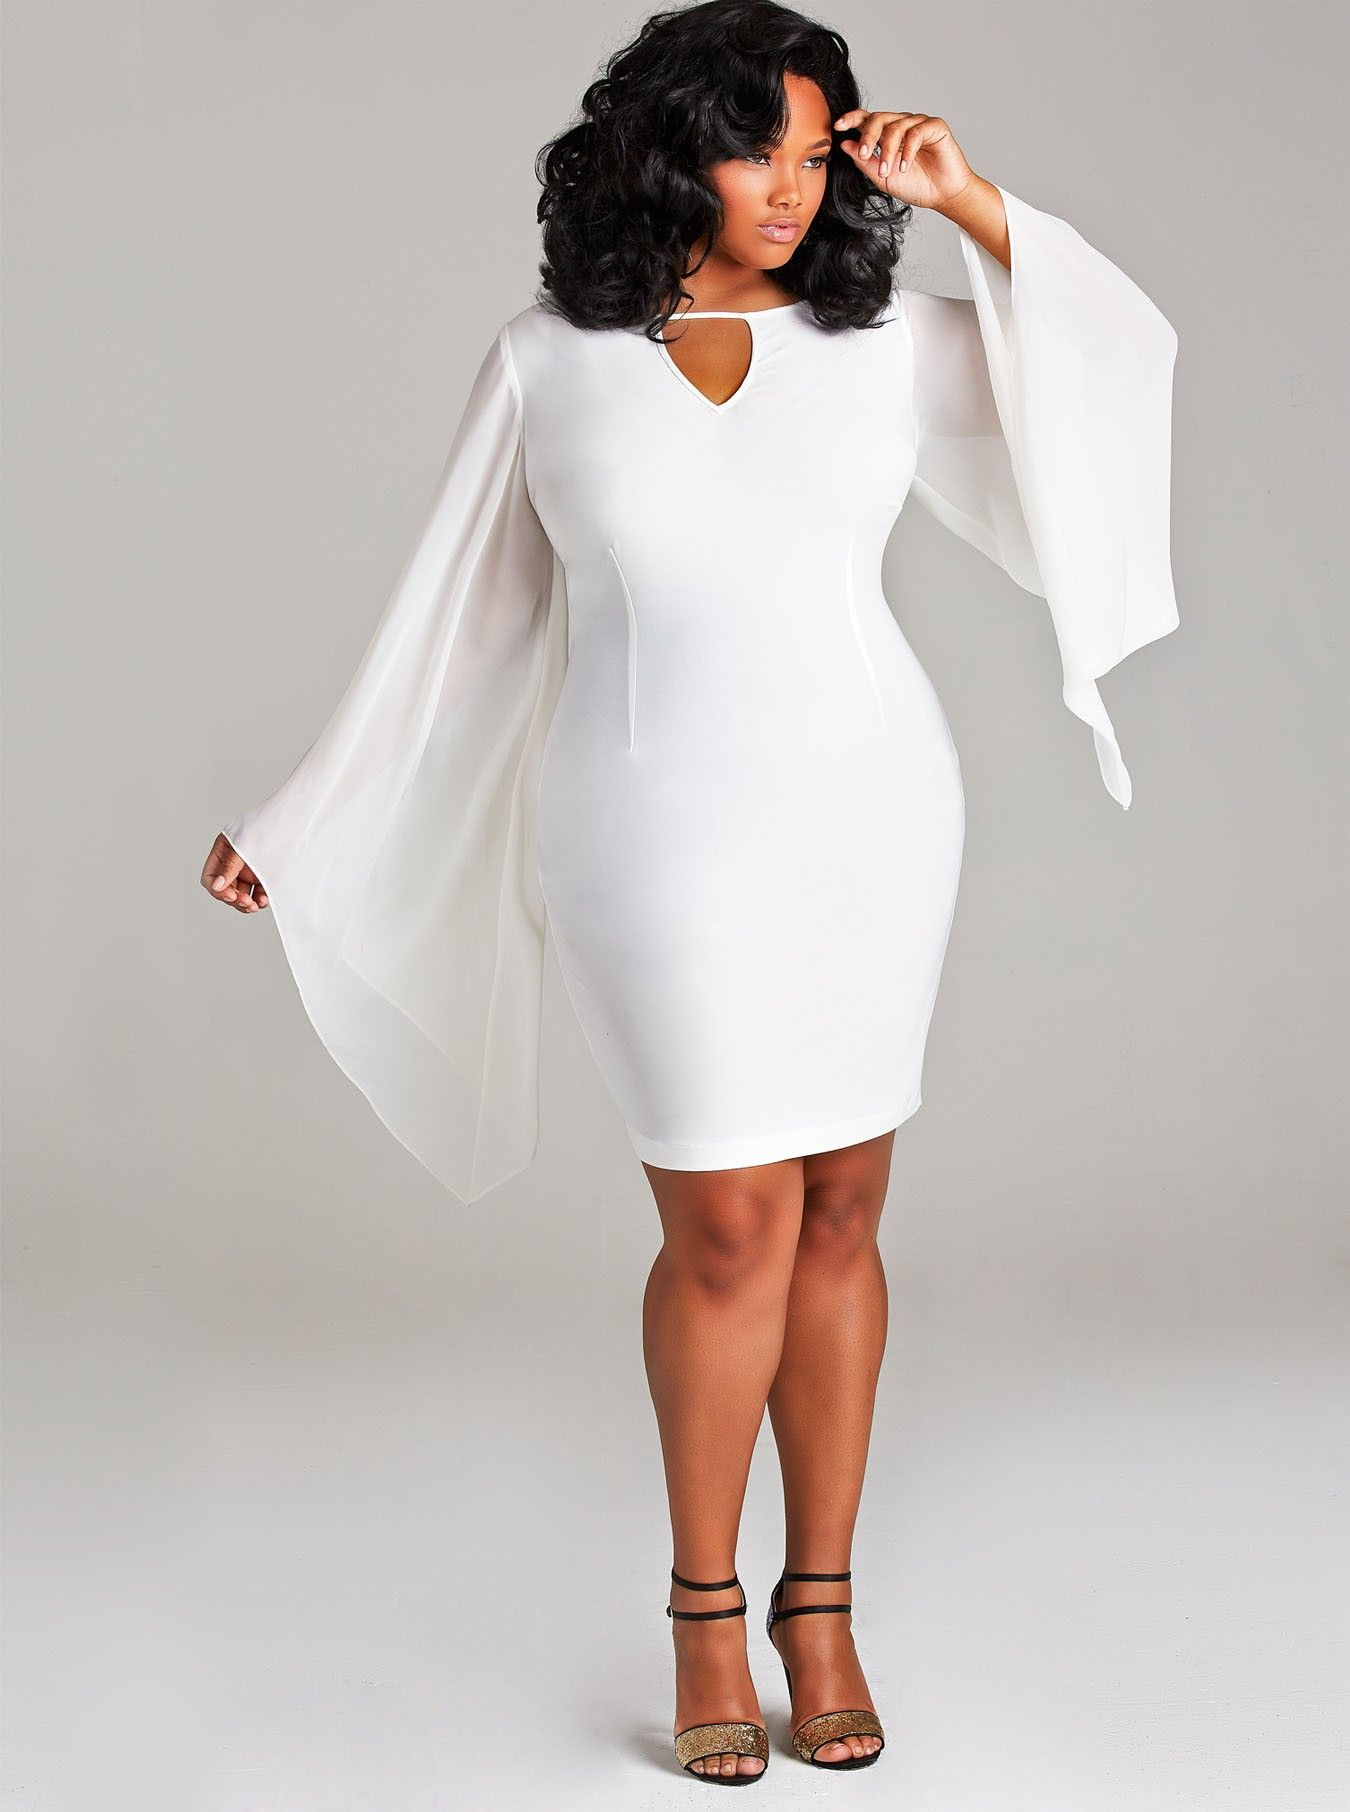 Monif The Simone Chiffon Sleeve Dress has all the romance of a ...